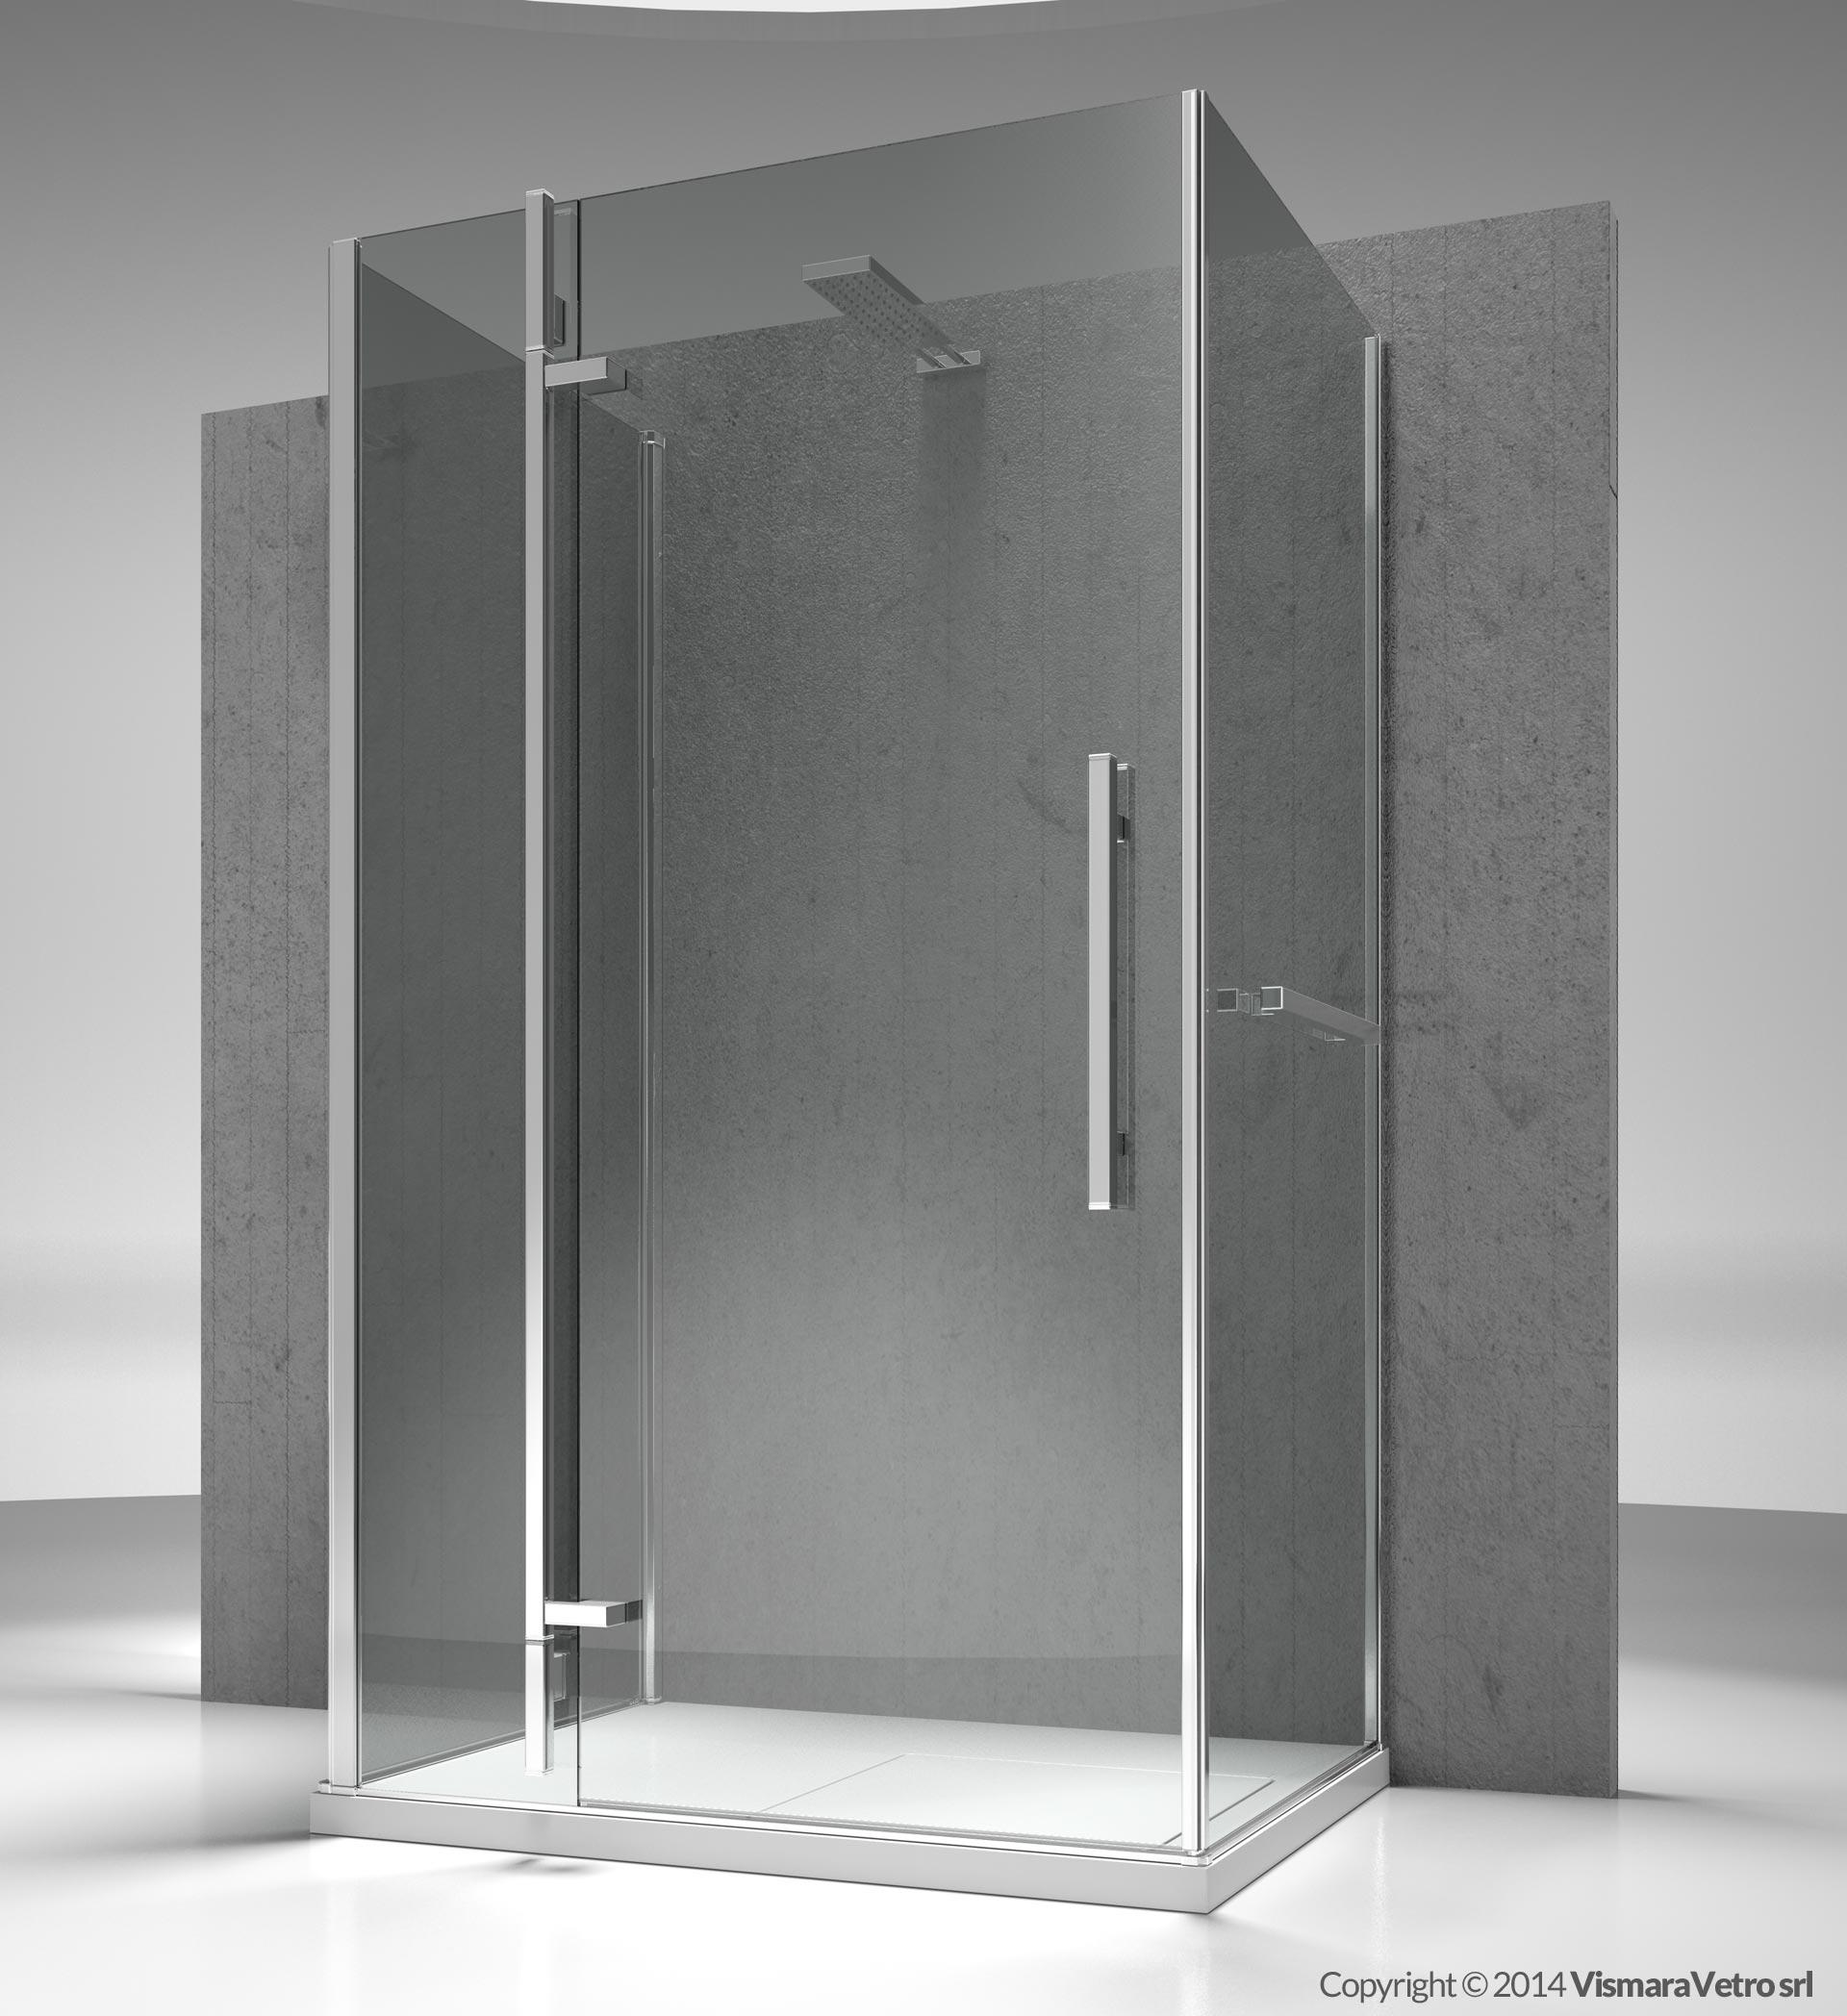 Modelo qf qa qg instalaci n contra pared Instalacion cabina ducha